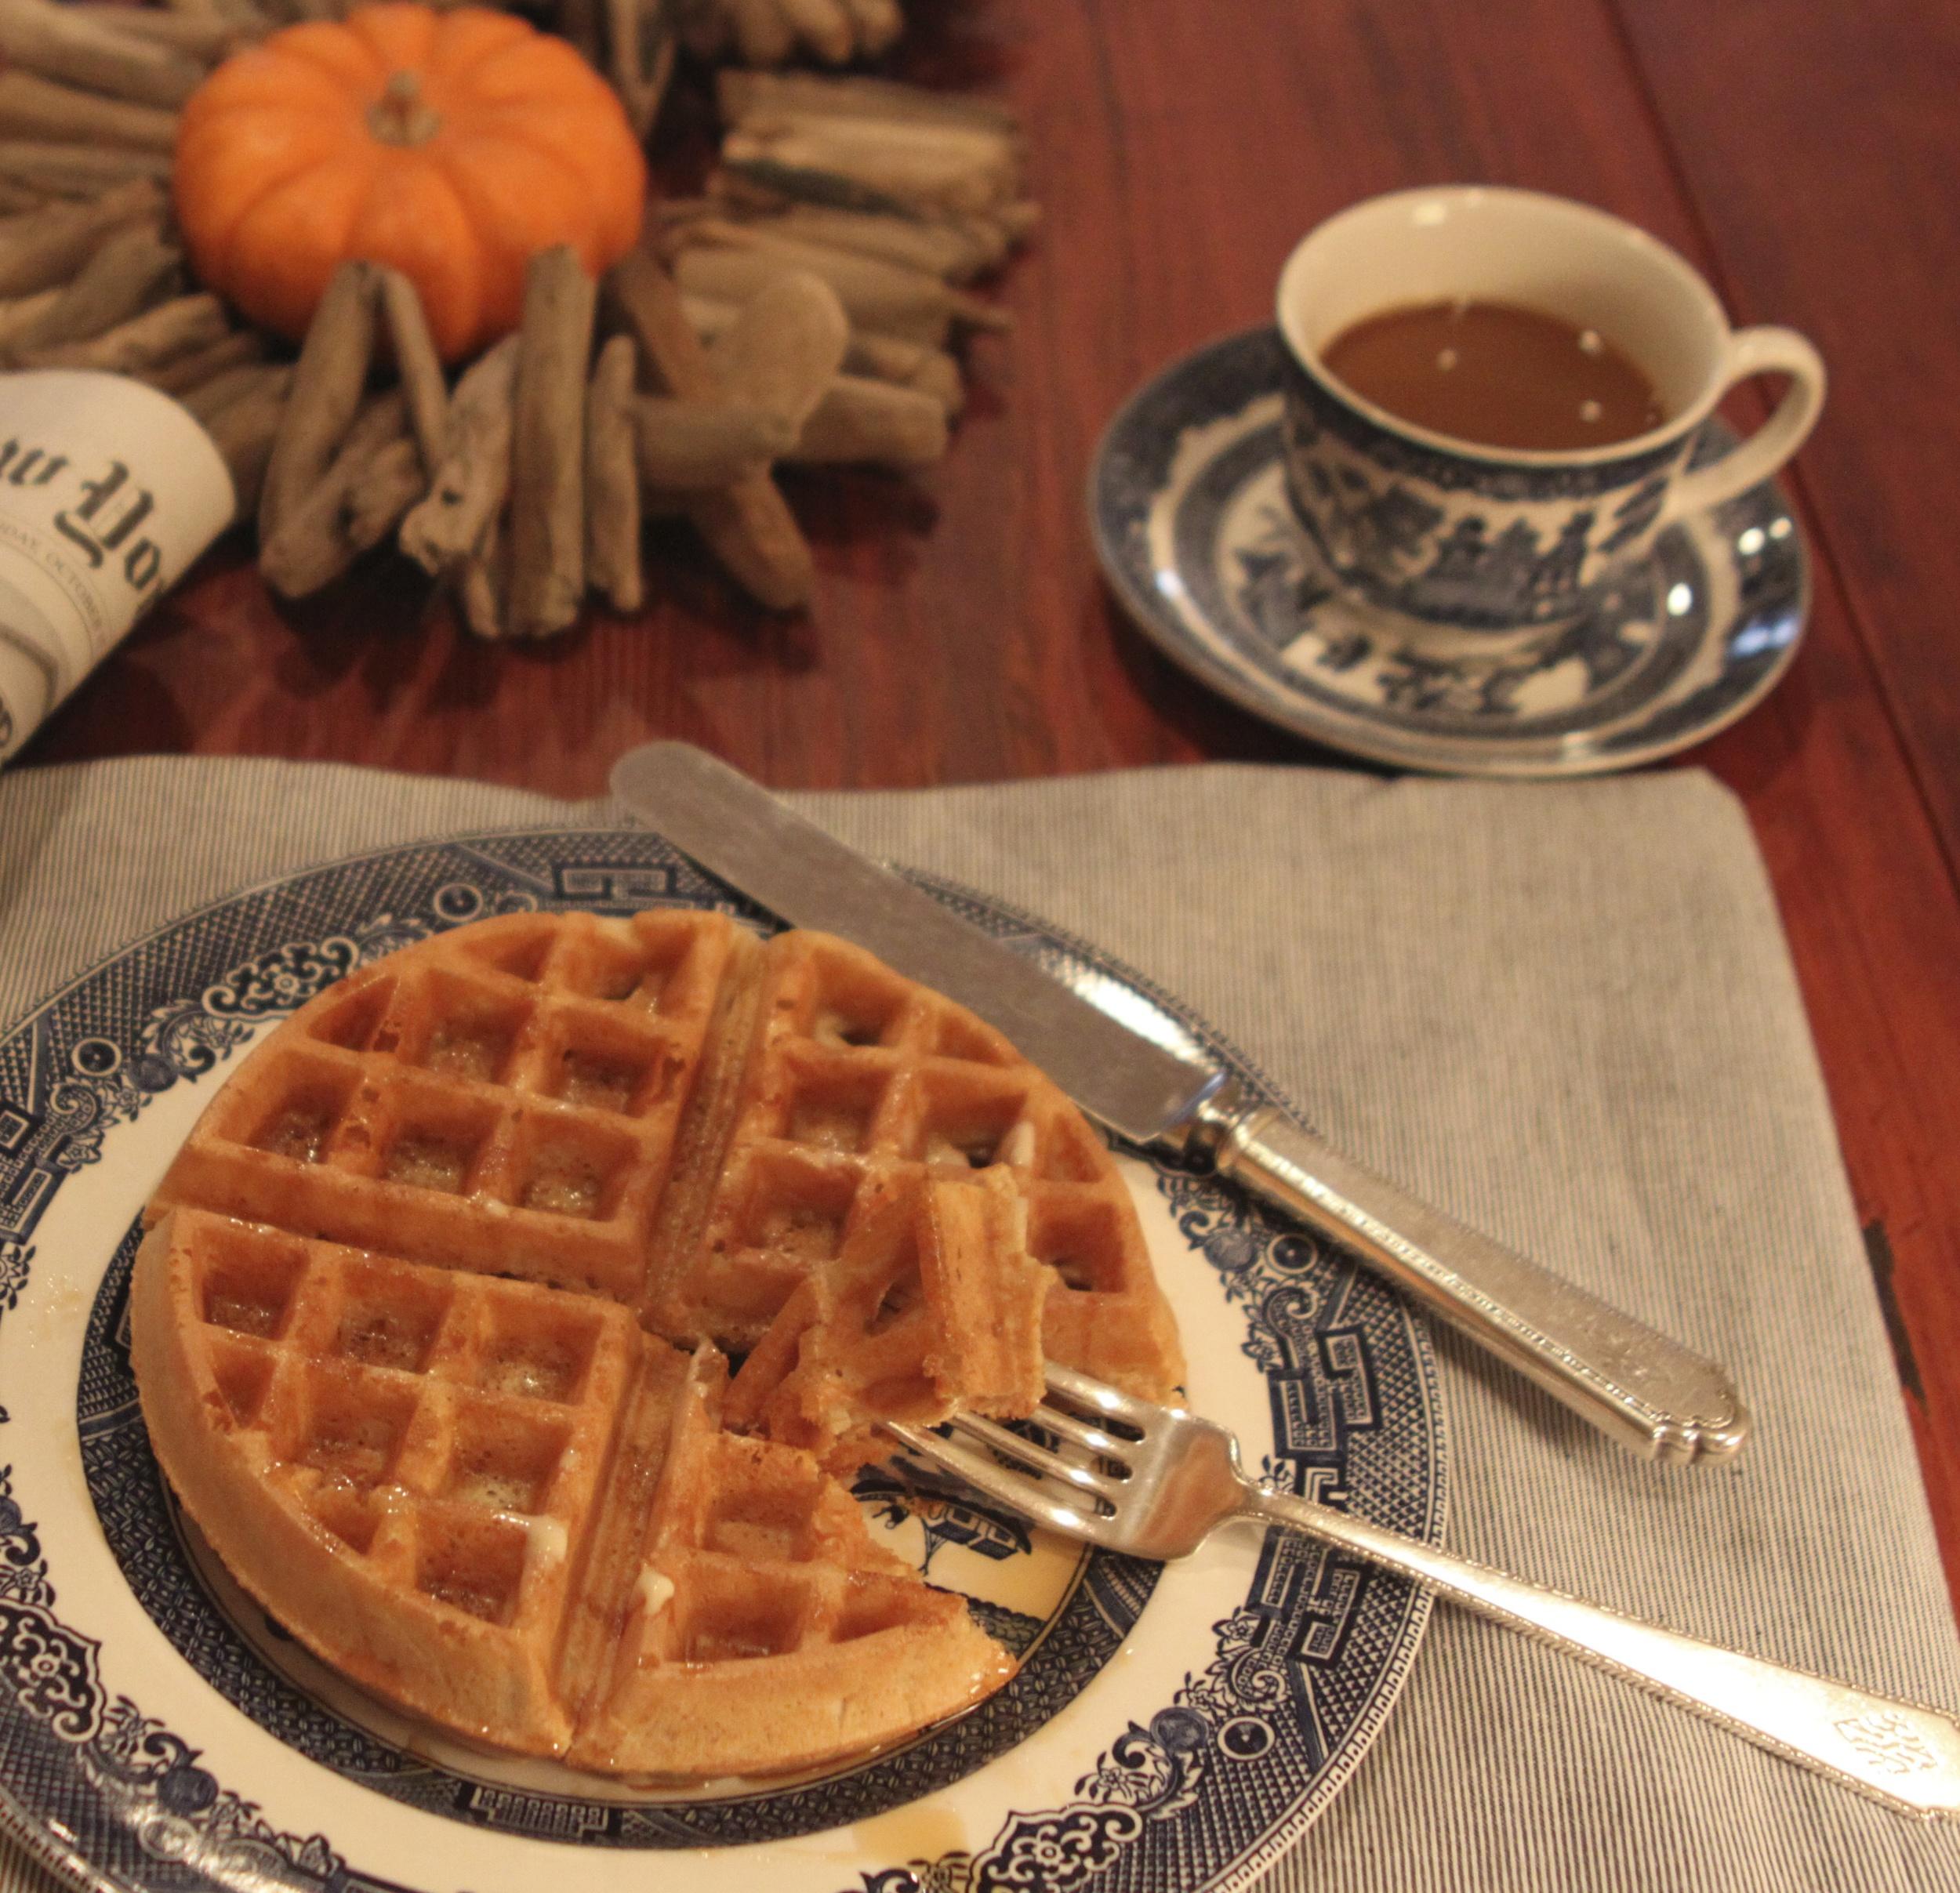 Gluten-Free & Dairy-Free Waffles